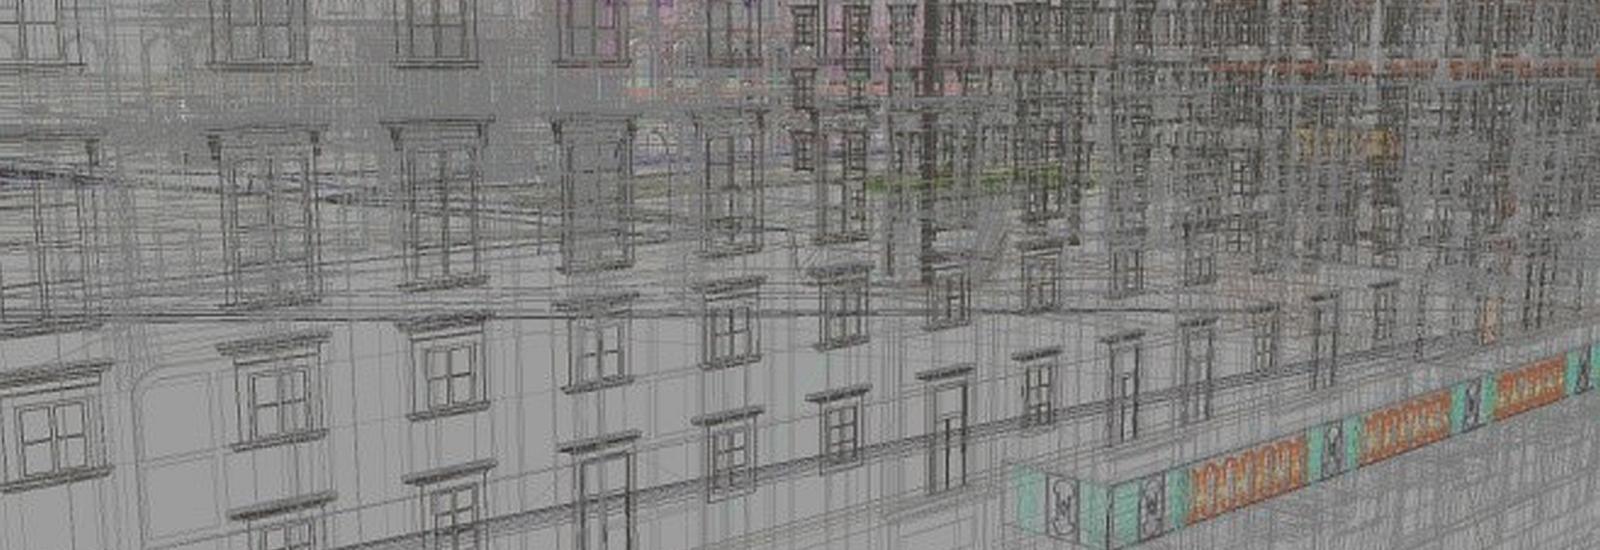 Vienna Hofburg 3D digital model